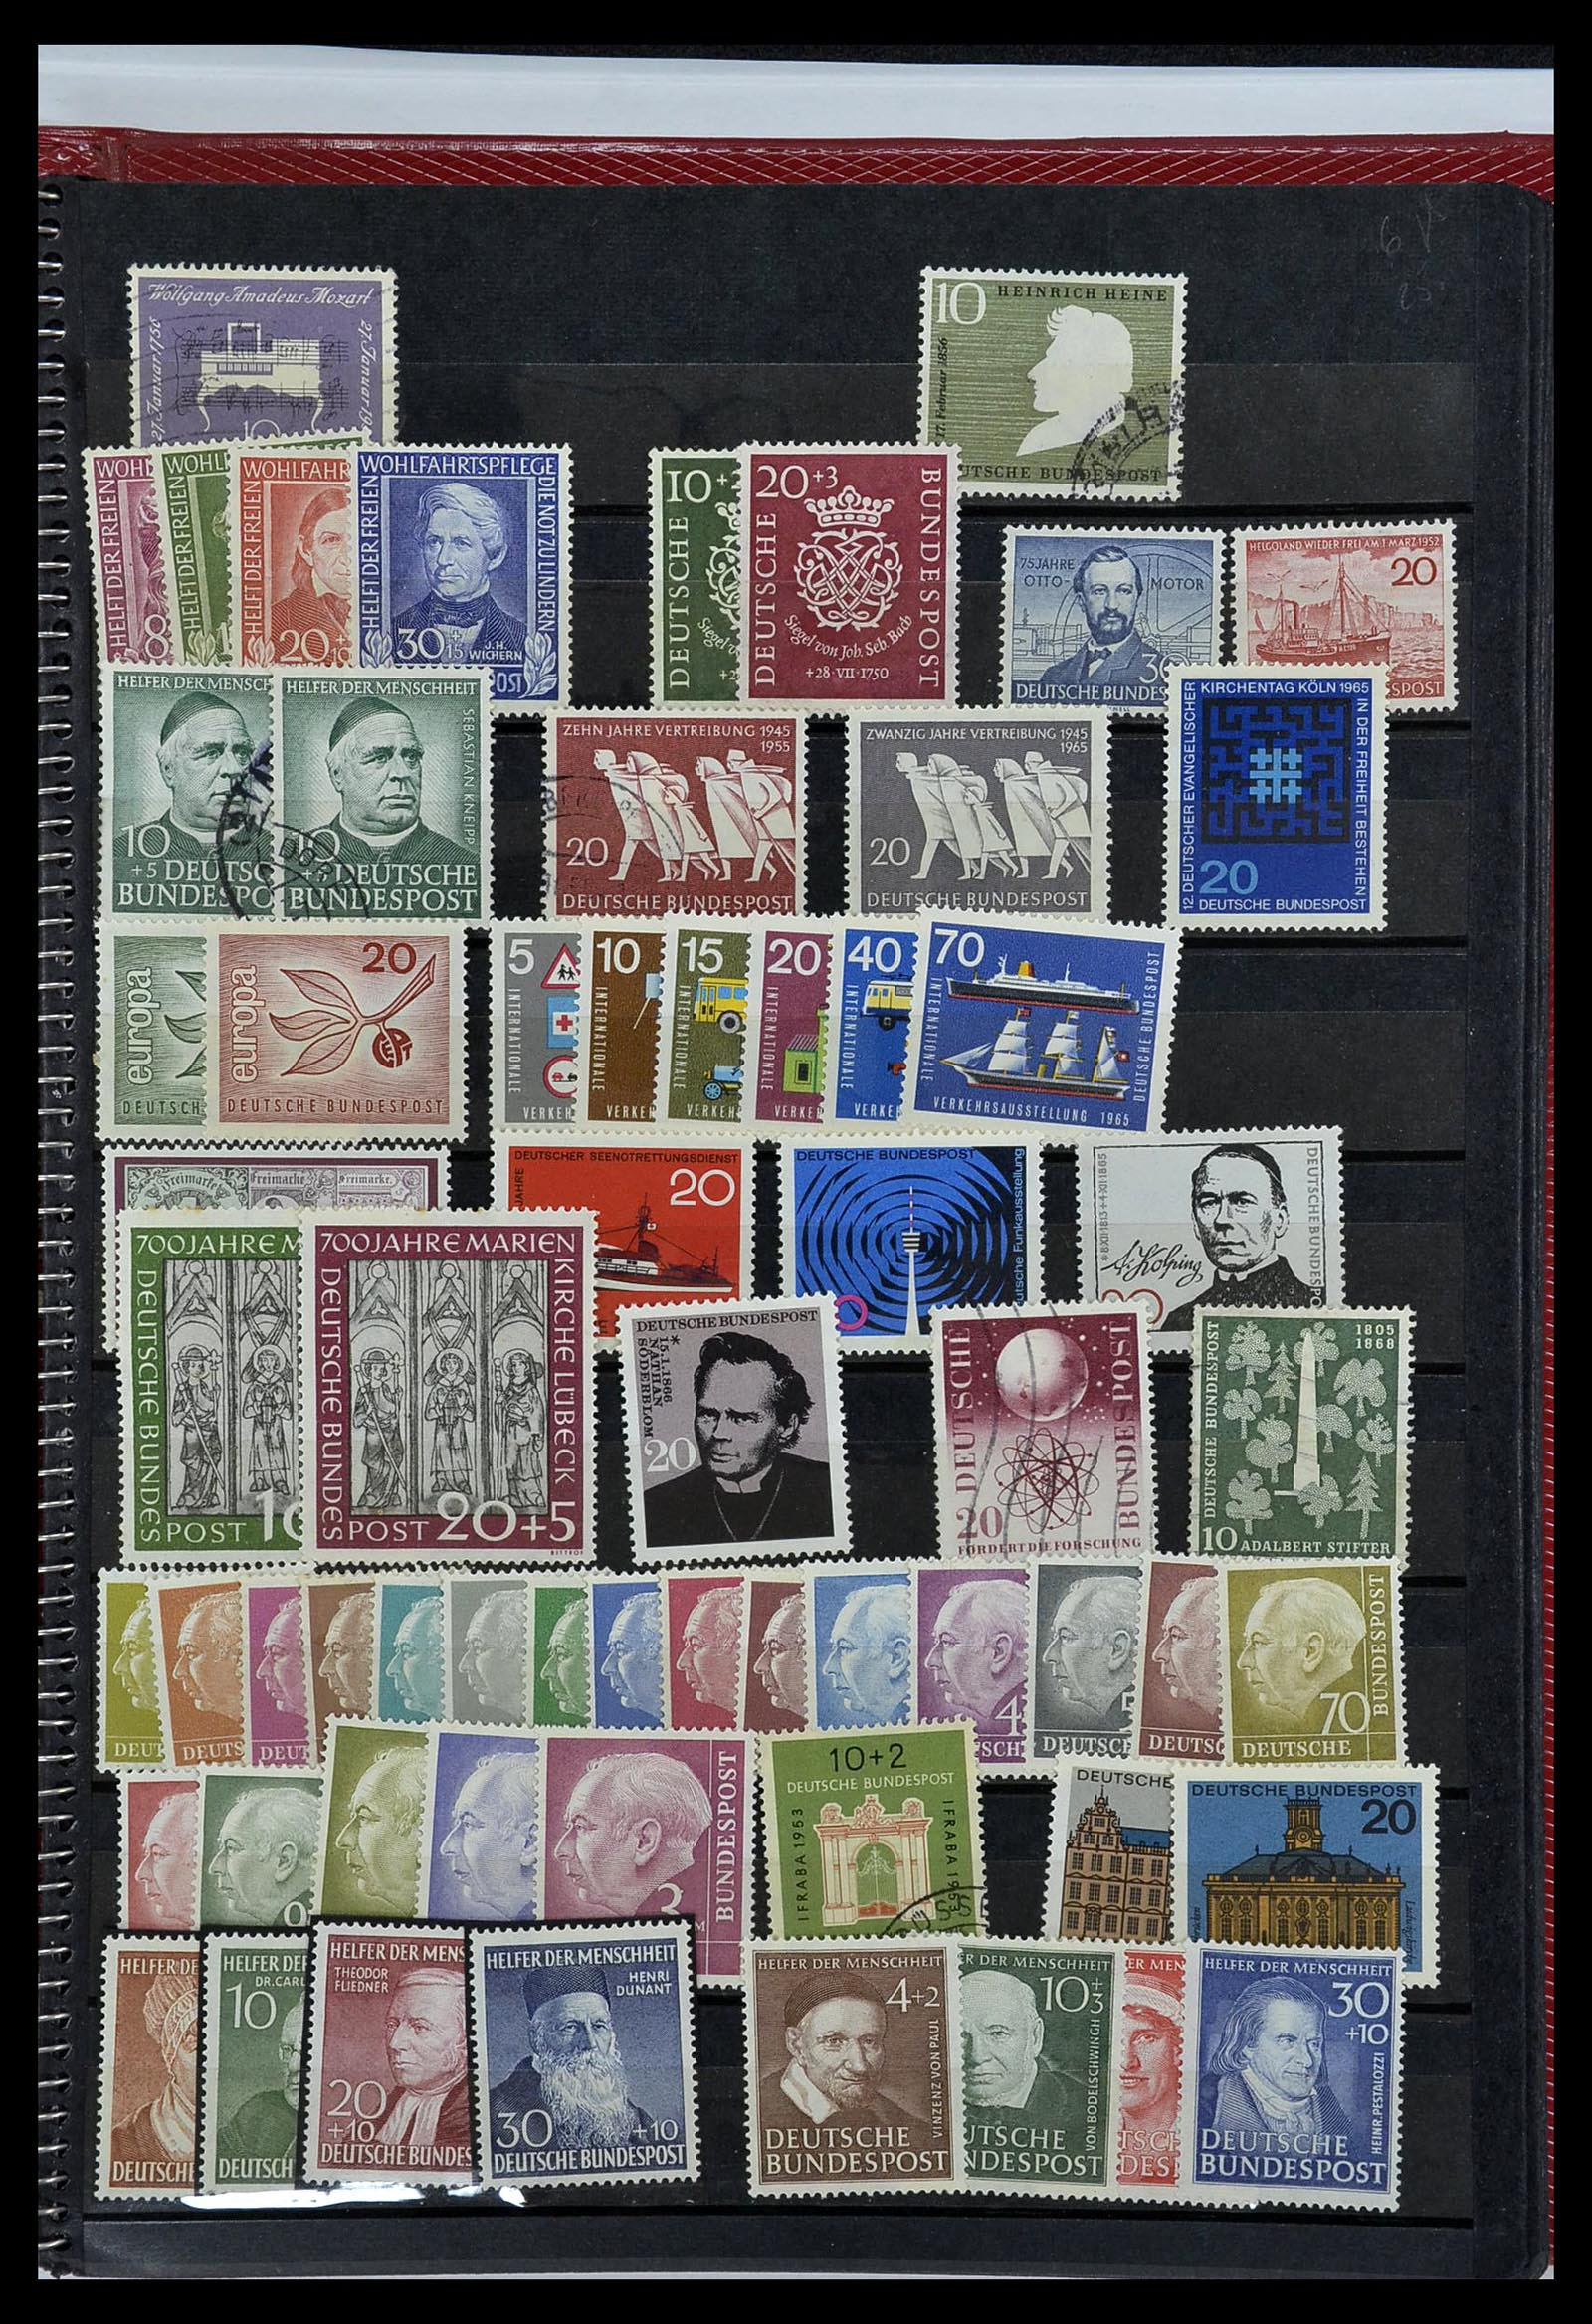 34169 001 - Postzegelverzameling 34169 Duitsland 1880-1955.